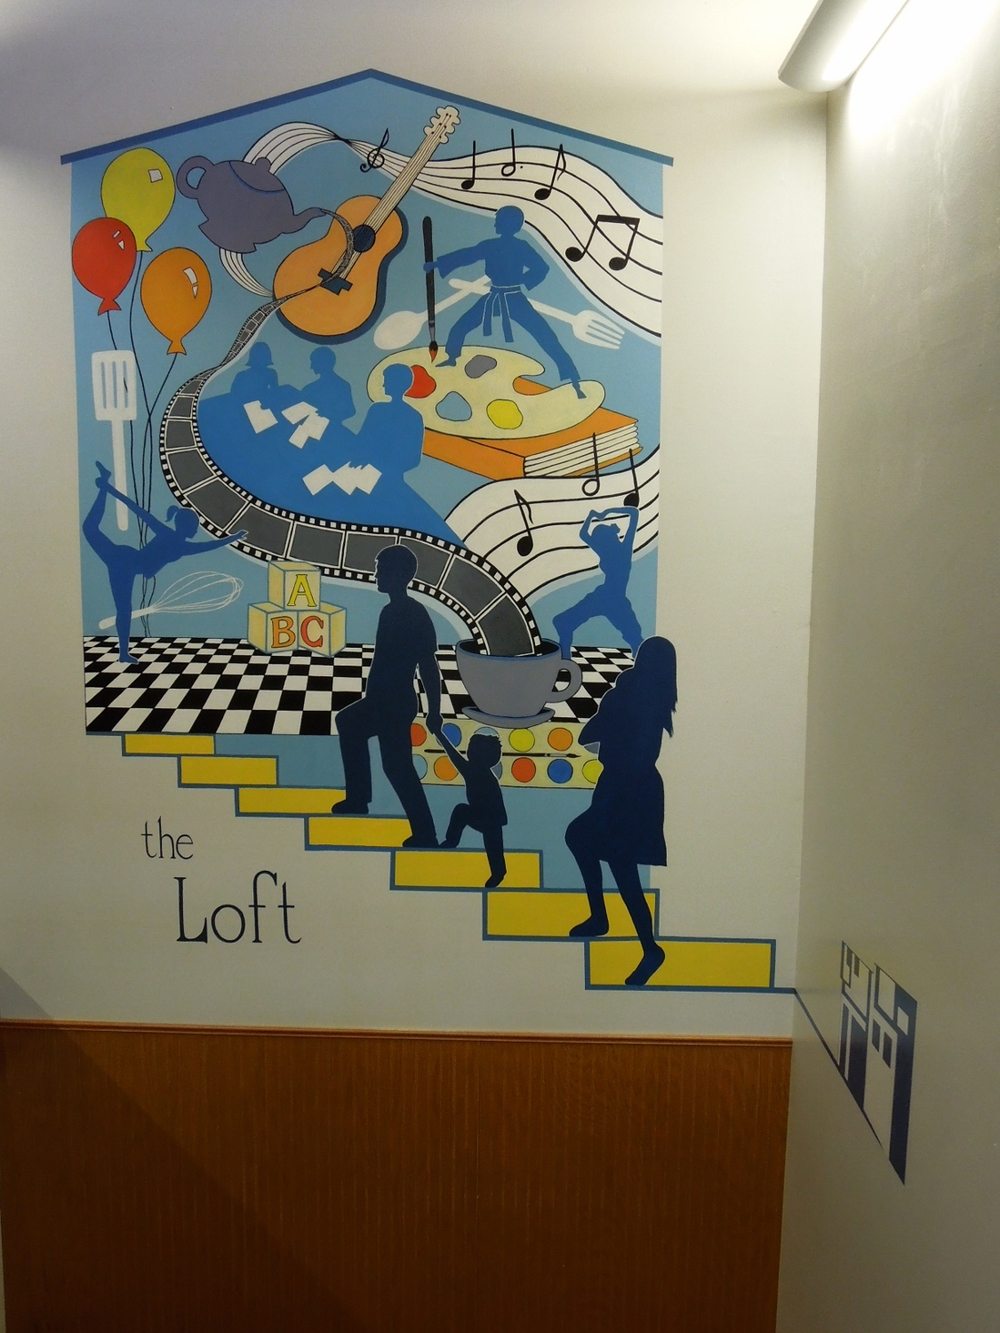 CSCC loft mural, Minneapolis, MN, 2013